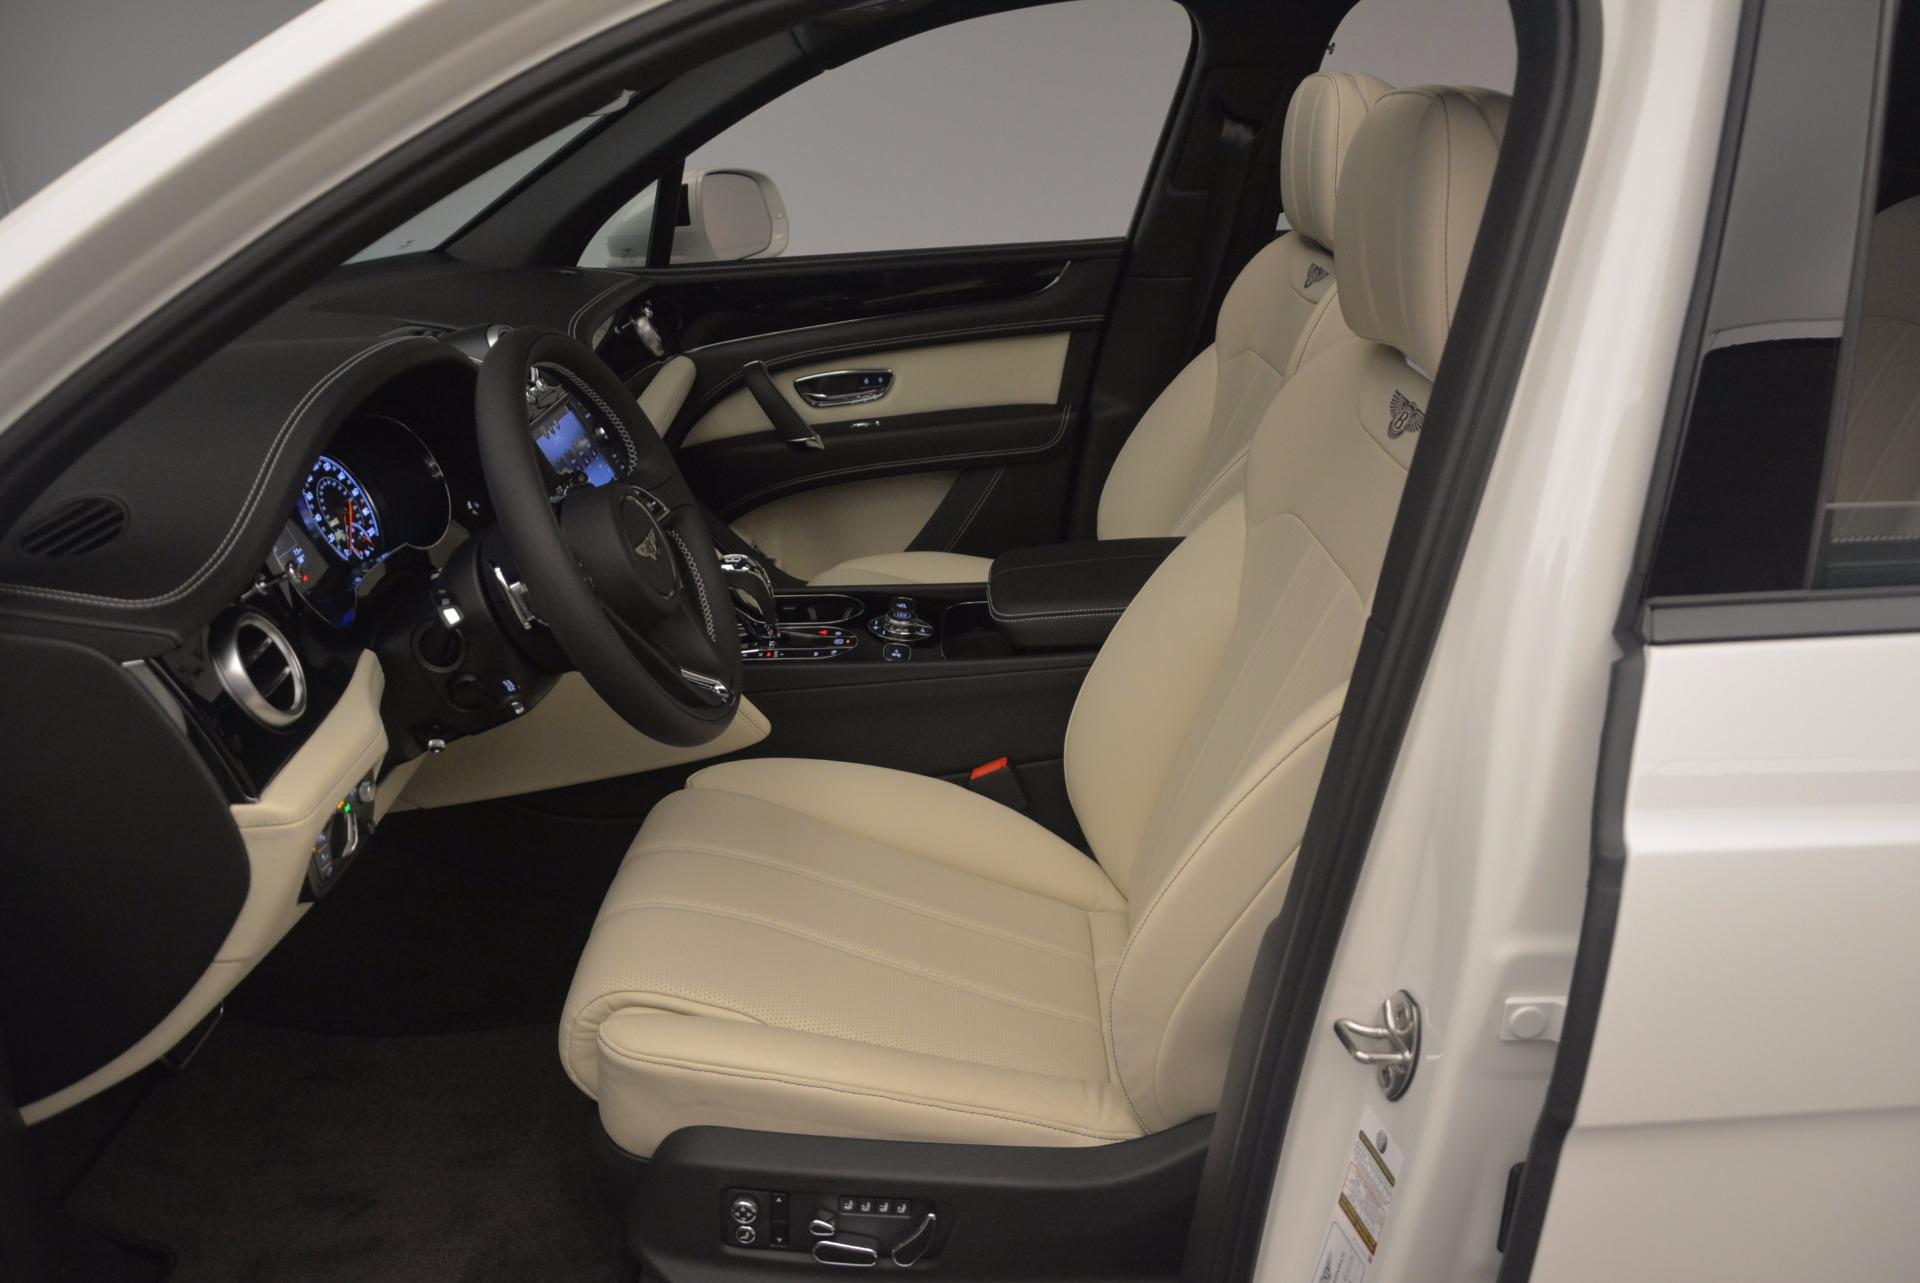 Used 2018 Bentley Bentayga Onyx For Sale In Greenwich, CT. Alfa Romeo of Greenwich, 7485 1549_p17